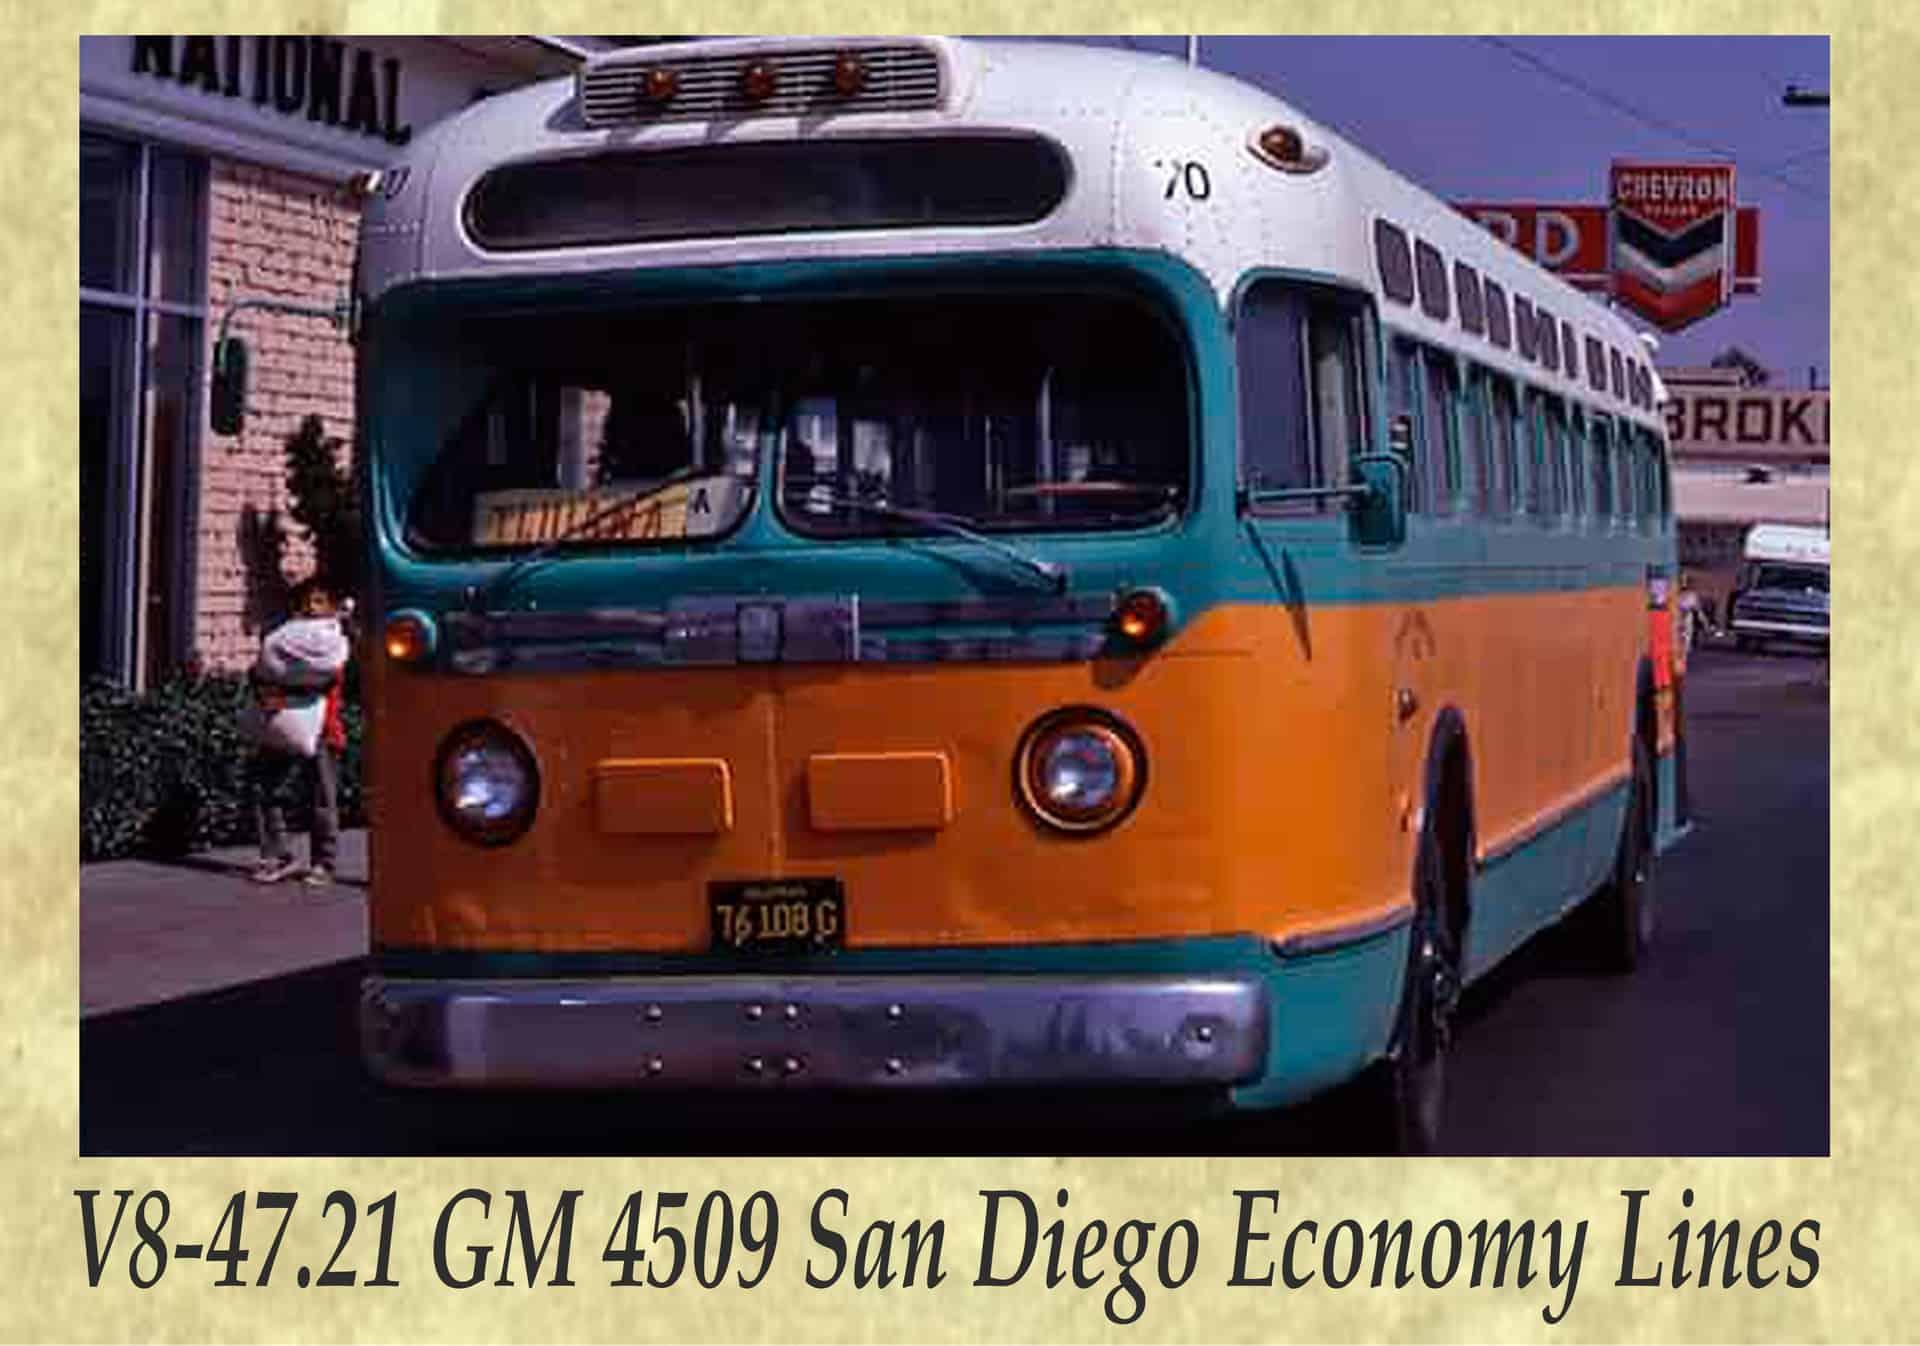 V8-47.21 GM 4509 San Diego Economy Lines